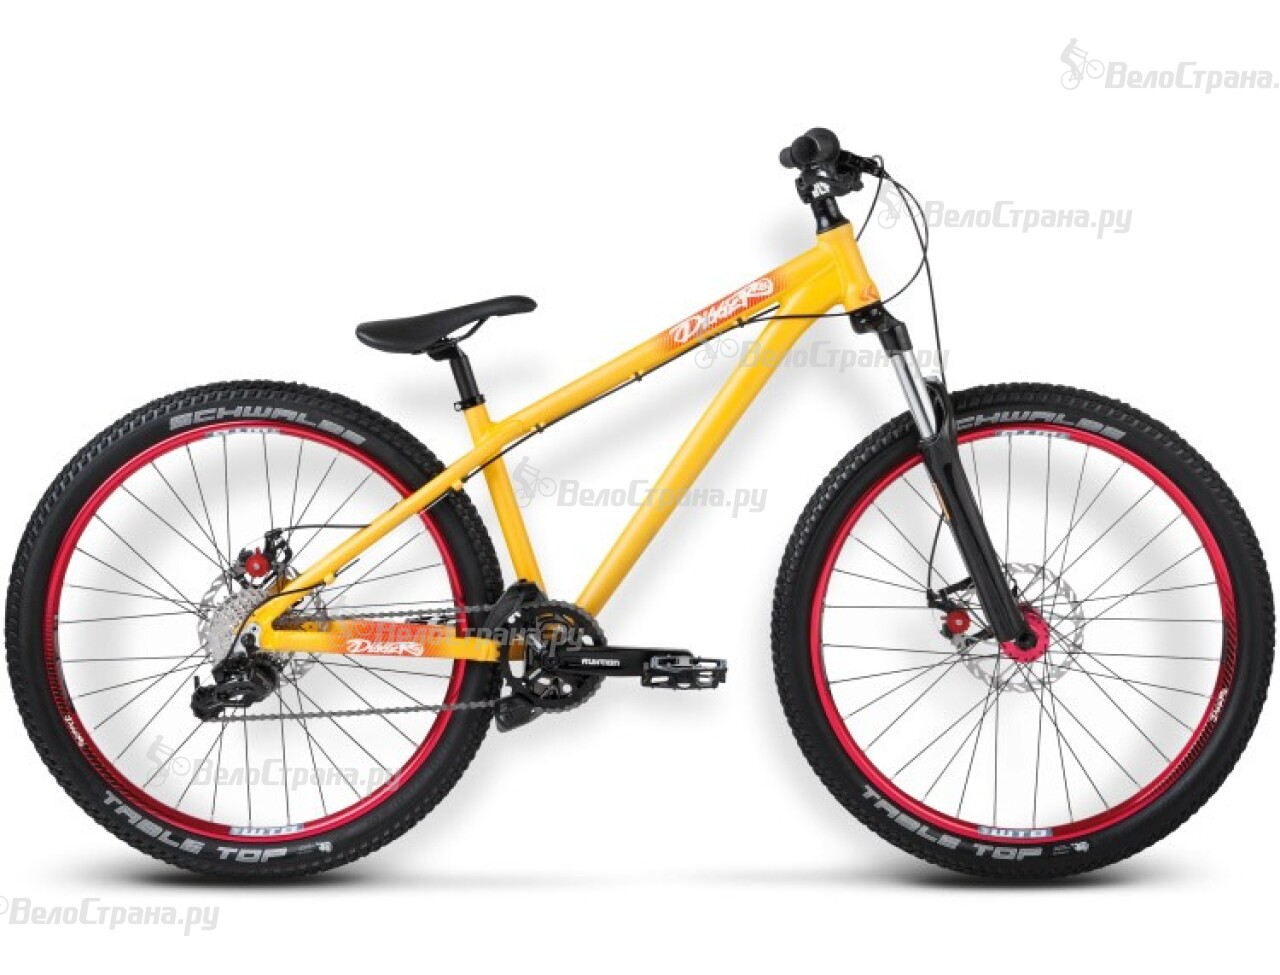 Велосипед Kross Digger (2015) 2015 wat498